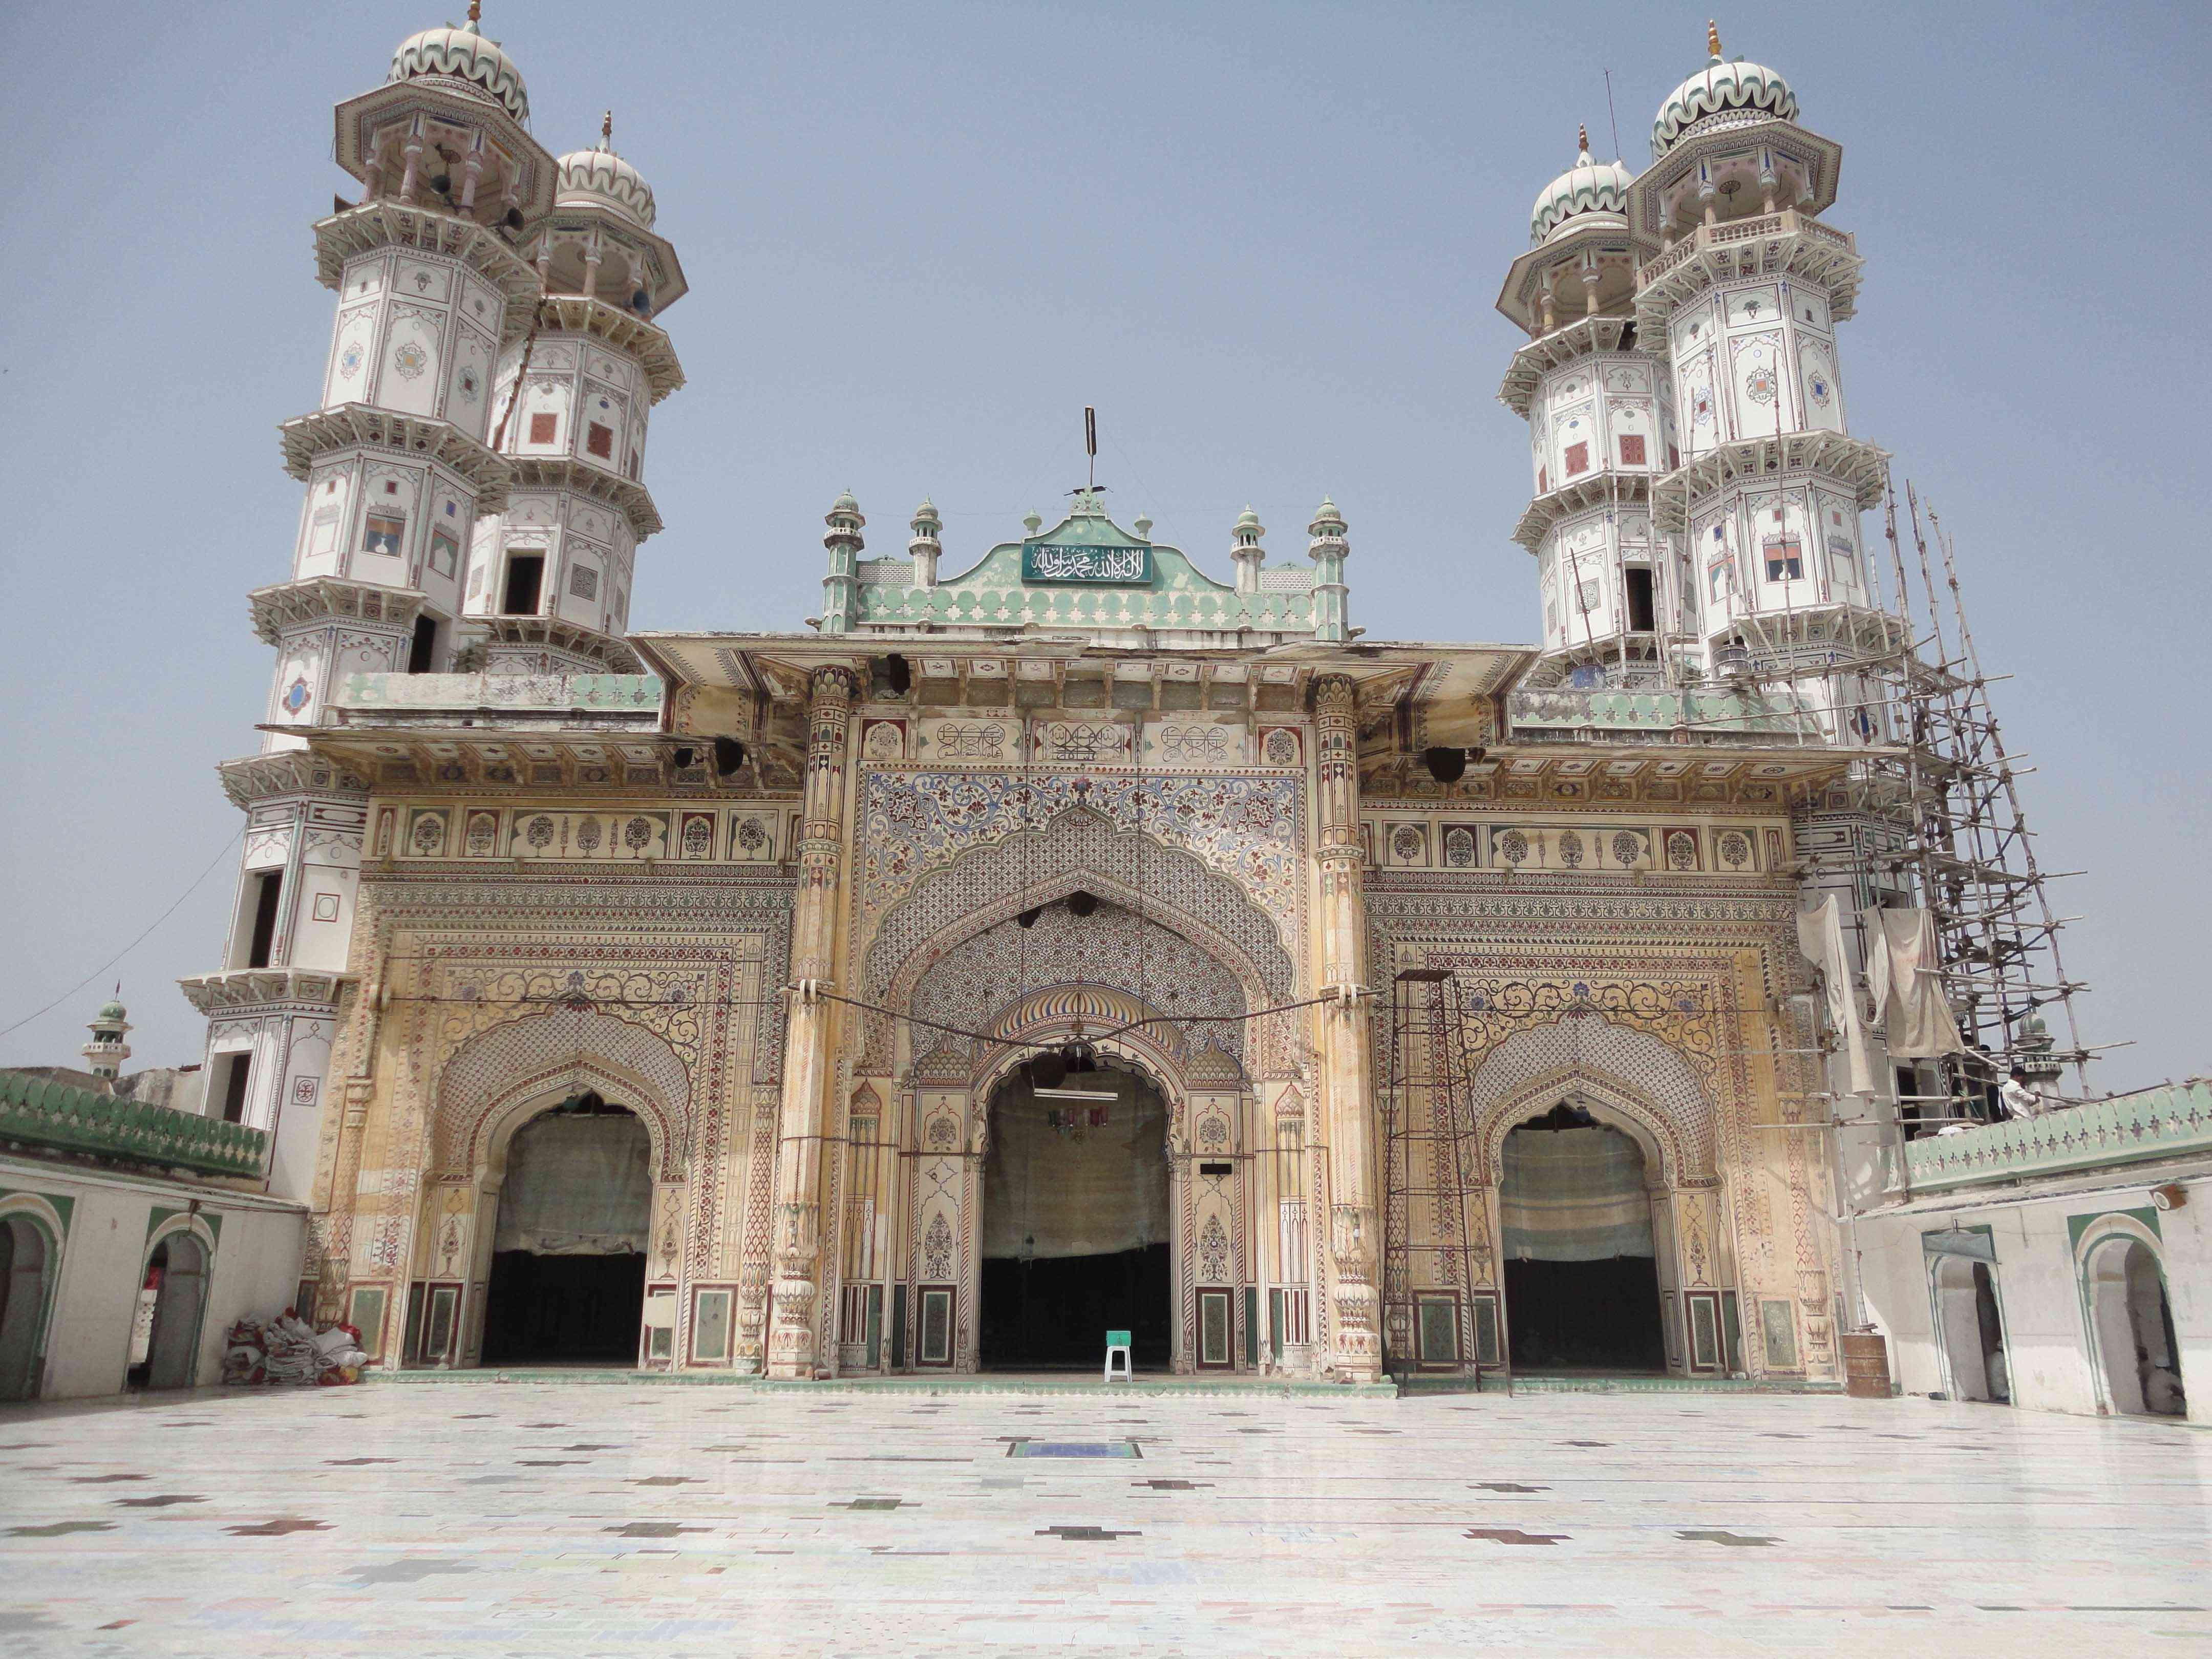 Tonk Jama Masjid